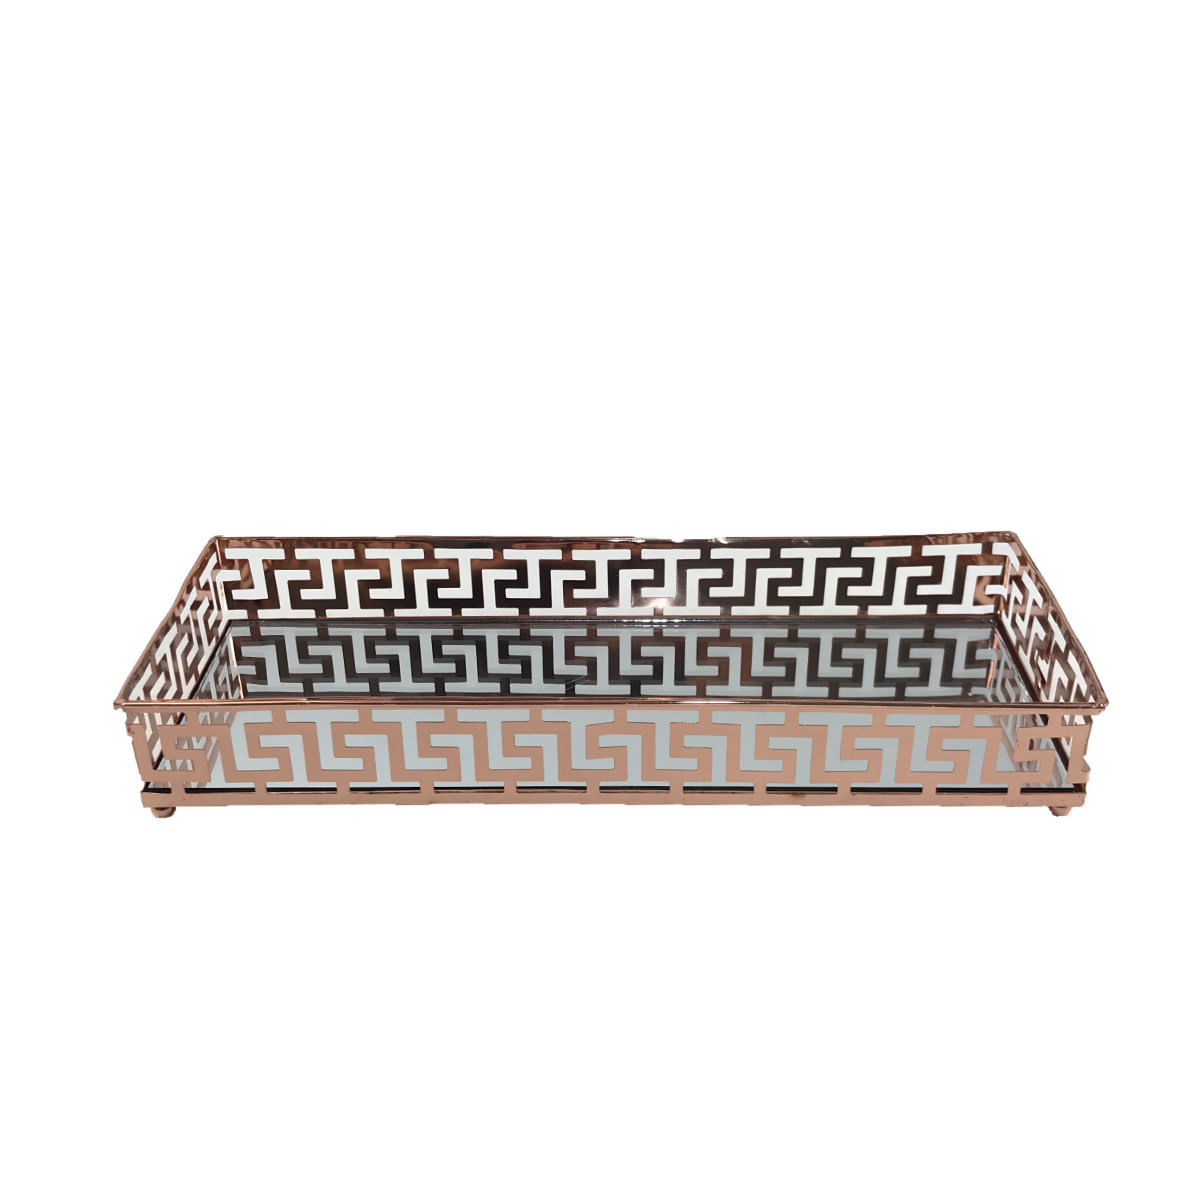 Bandeja Decorativa de Metal Espelhada - Cobre 30cm